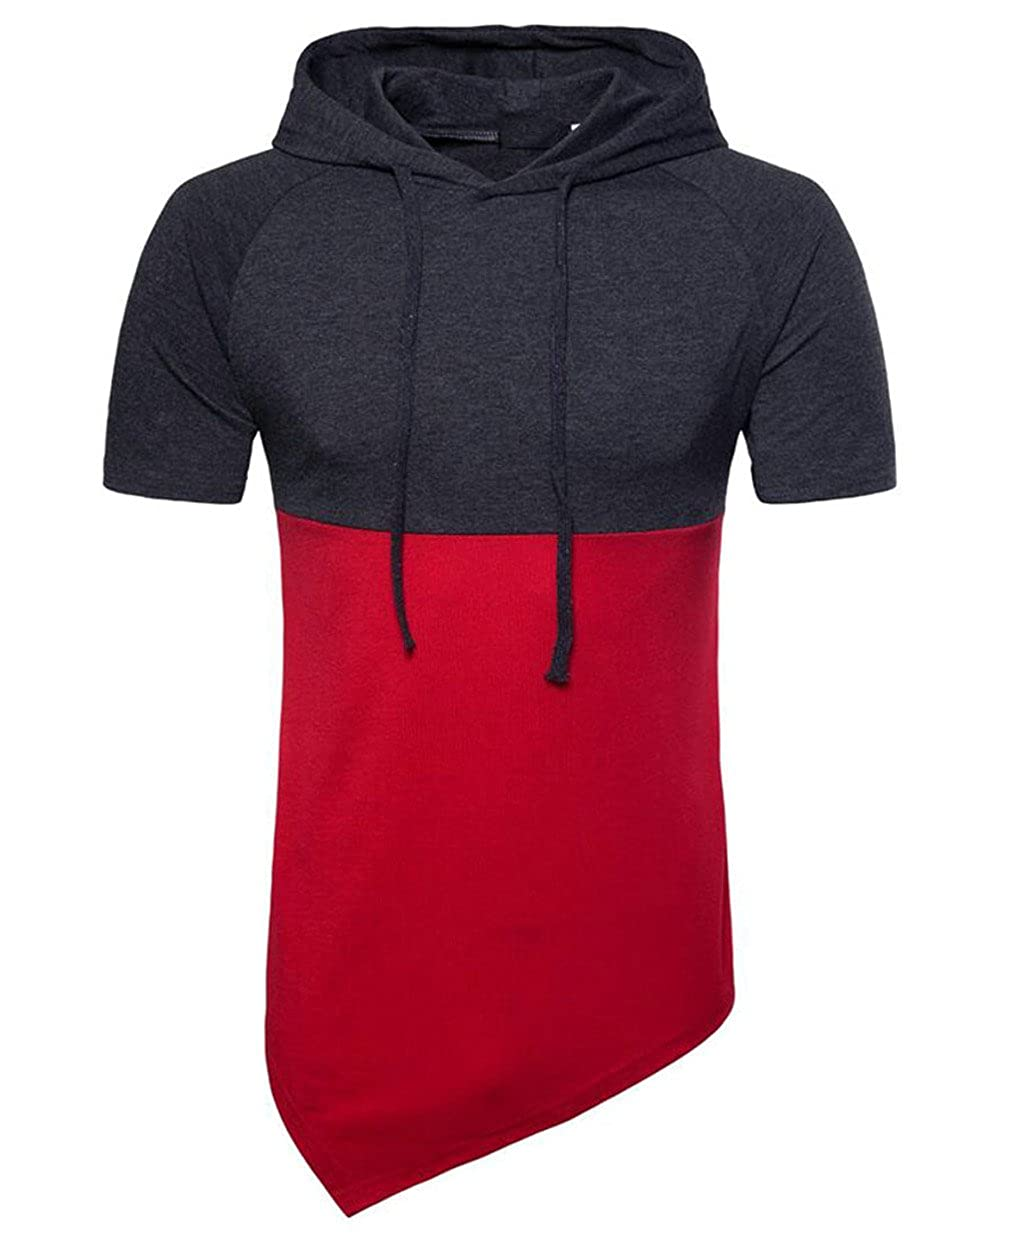 mydeshop Mens Short Sleeve Drawstring Hood Hit Color Asymmetrical-Hem Stitching T-Shirt